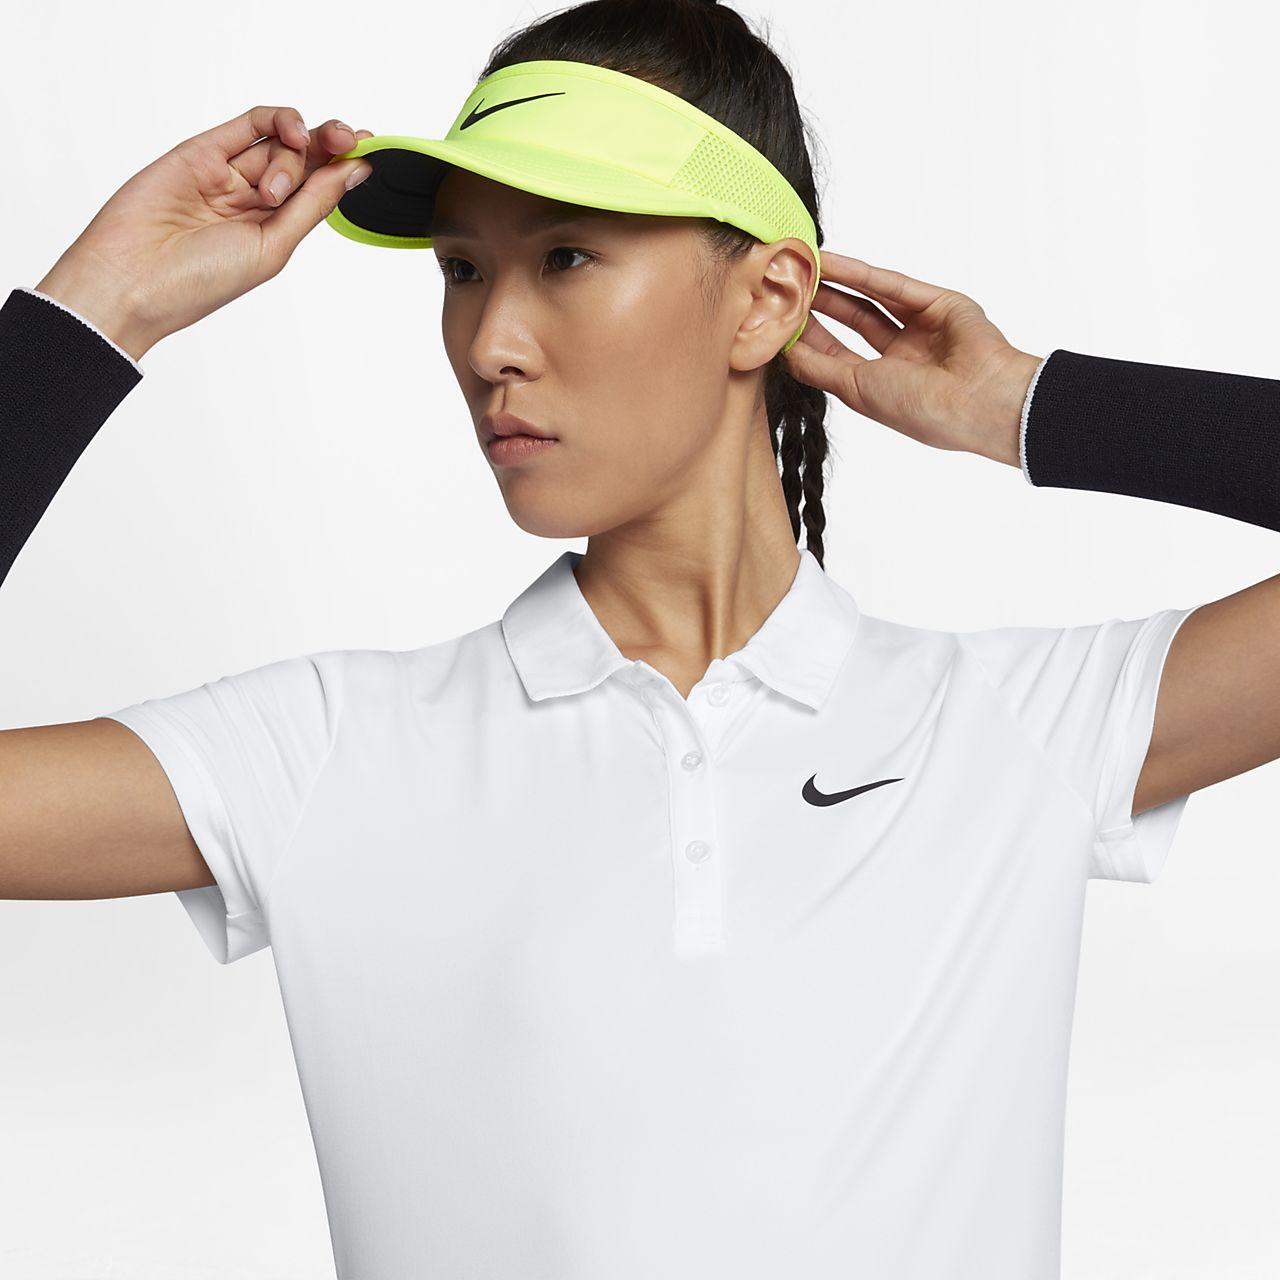 Tennispikétröja NikeCourt Pure för kvinnor